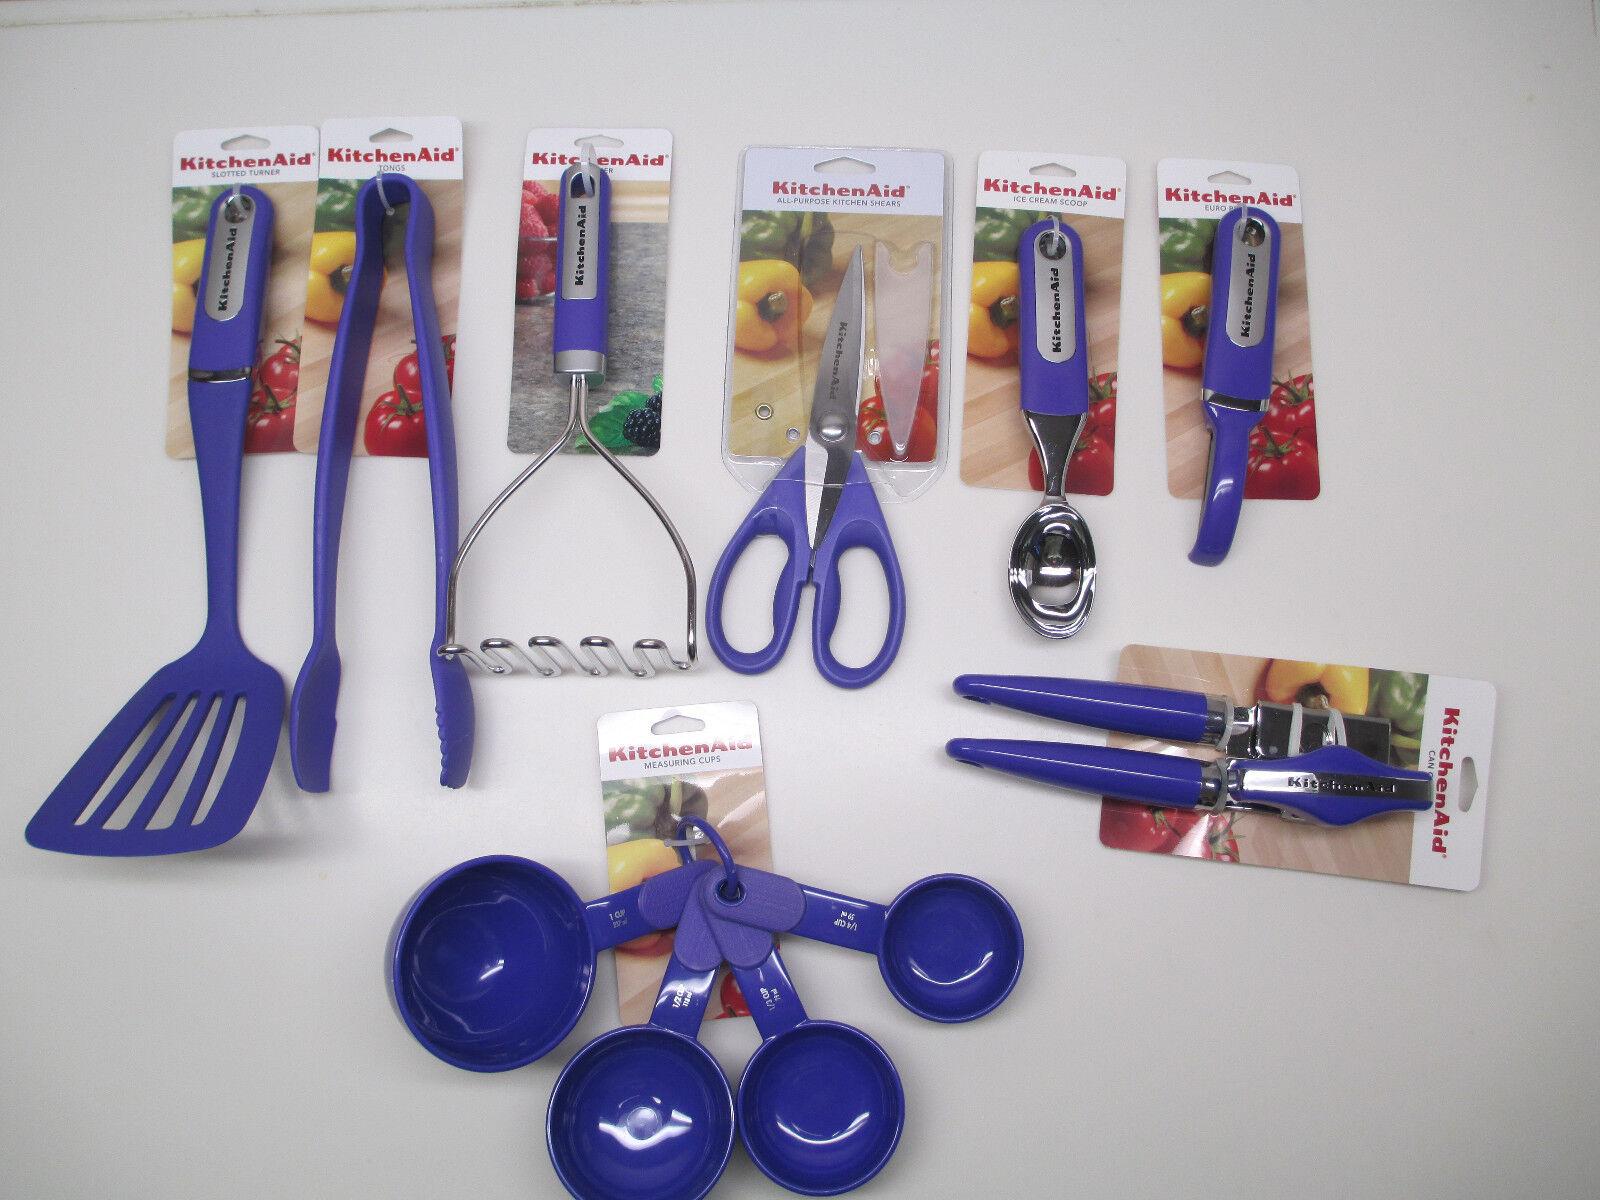 KitchenAid orchid light purple / lilac  kitchen utensils